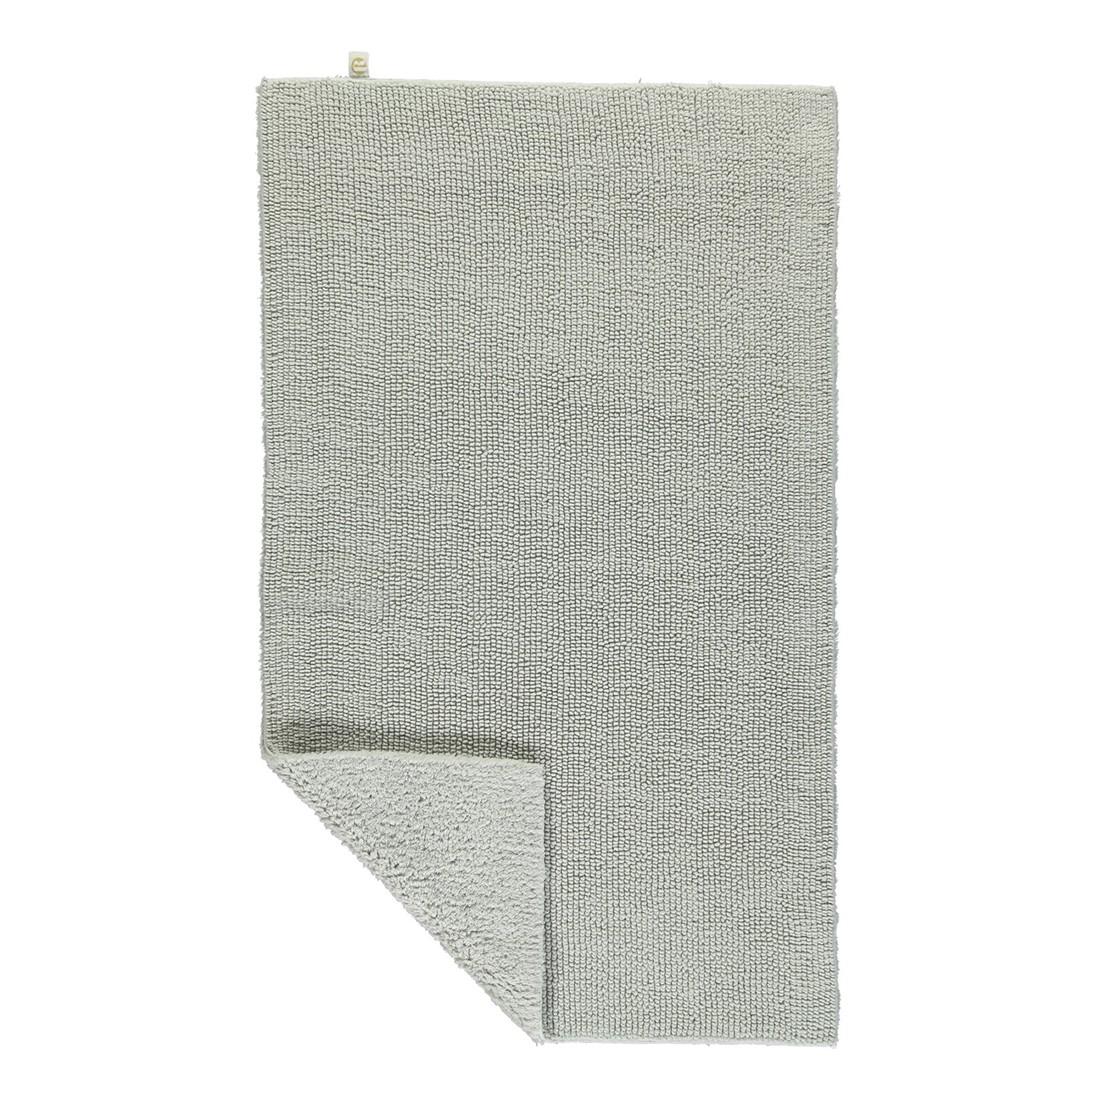 Badteppich Pur - 100% Baumwolle perlGrau - 11 - 70 x 130 cm, Rhomtuft